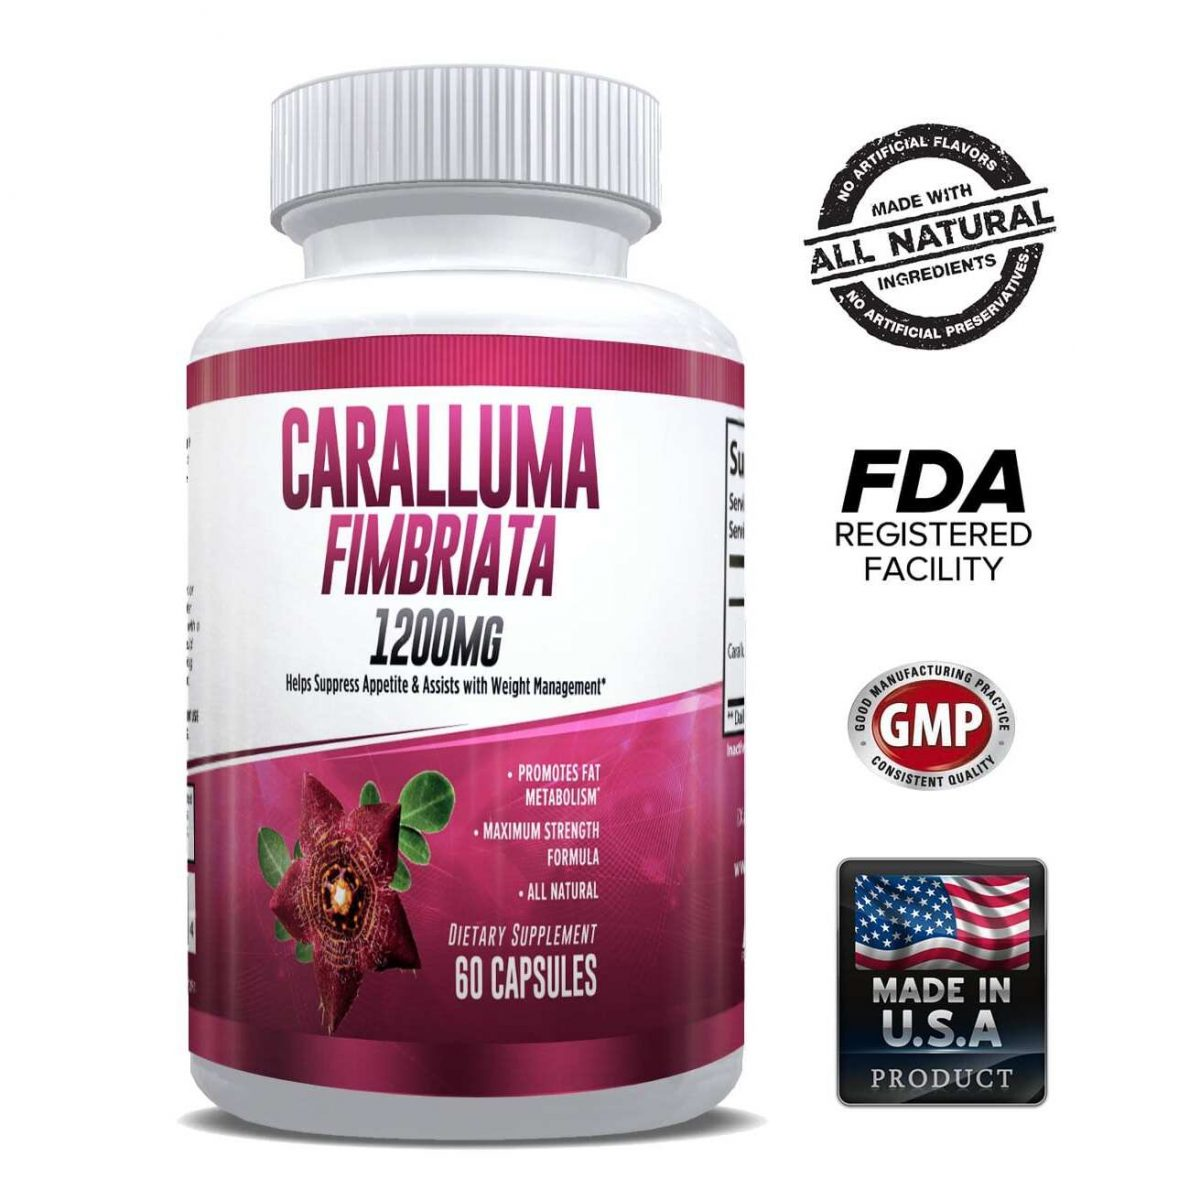 Pure Caralluma Fimbriata 1200mg Max Strength – Appetite Suppressant, Increase Fat Burn, Weight Loss Supplement, Non-Stim - for Men & Women - 1 Month-0